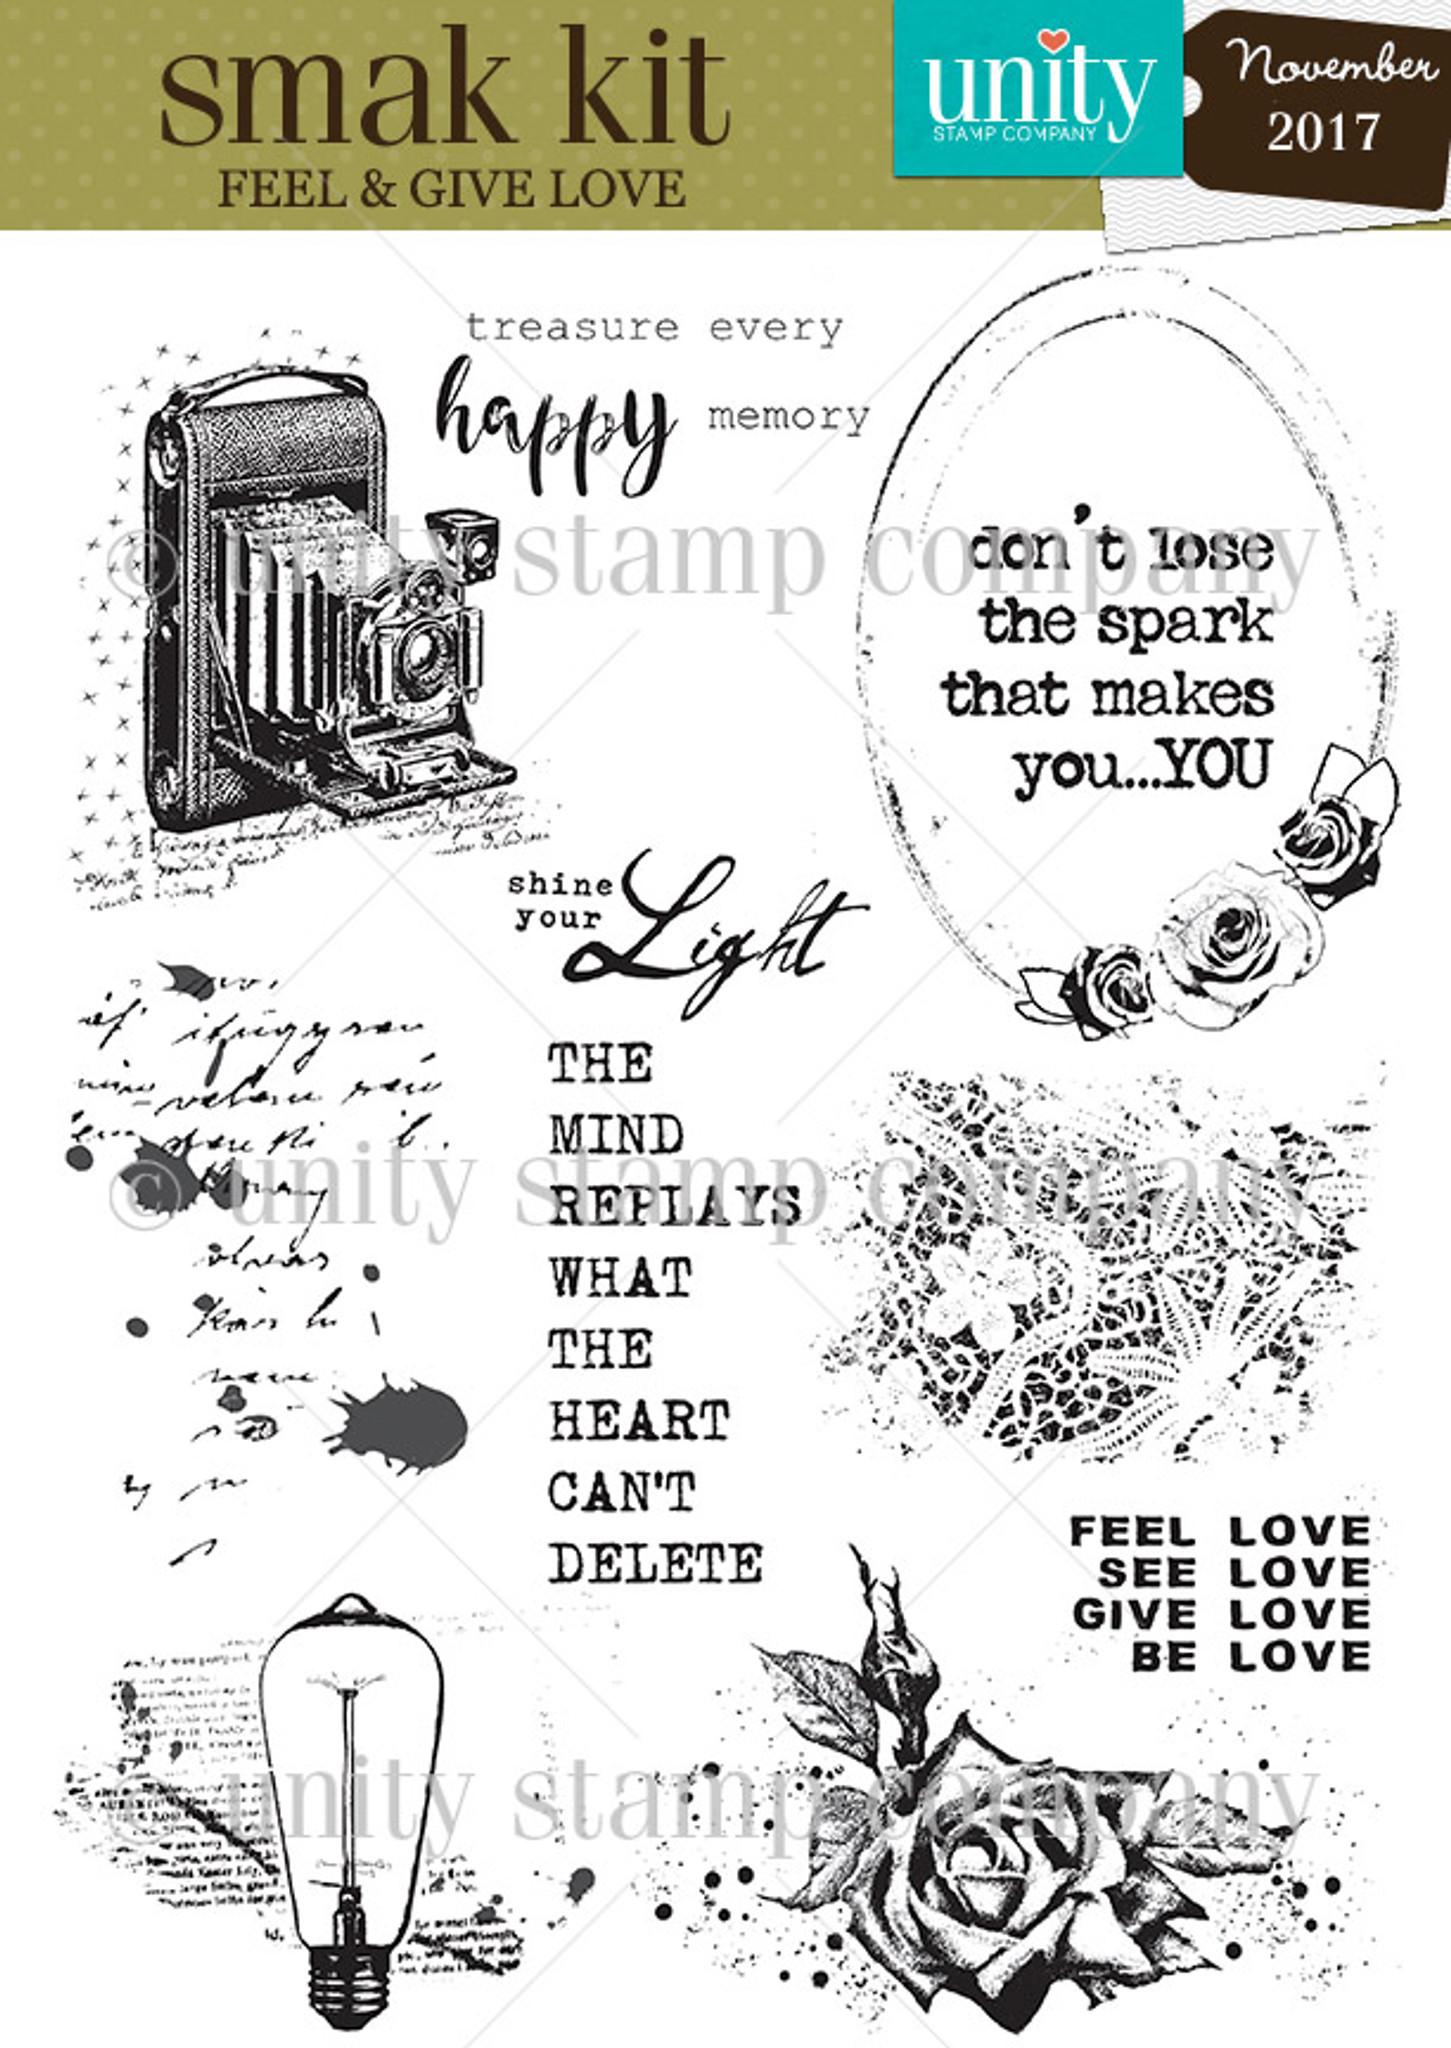 Feel & Give Love {smak 11/17}